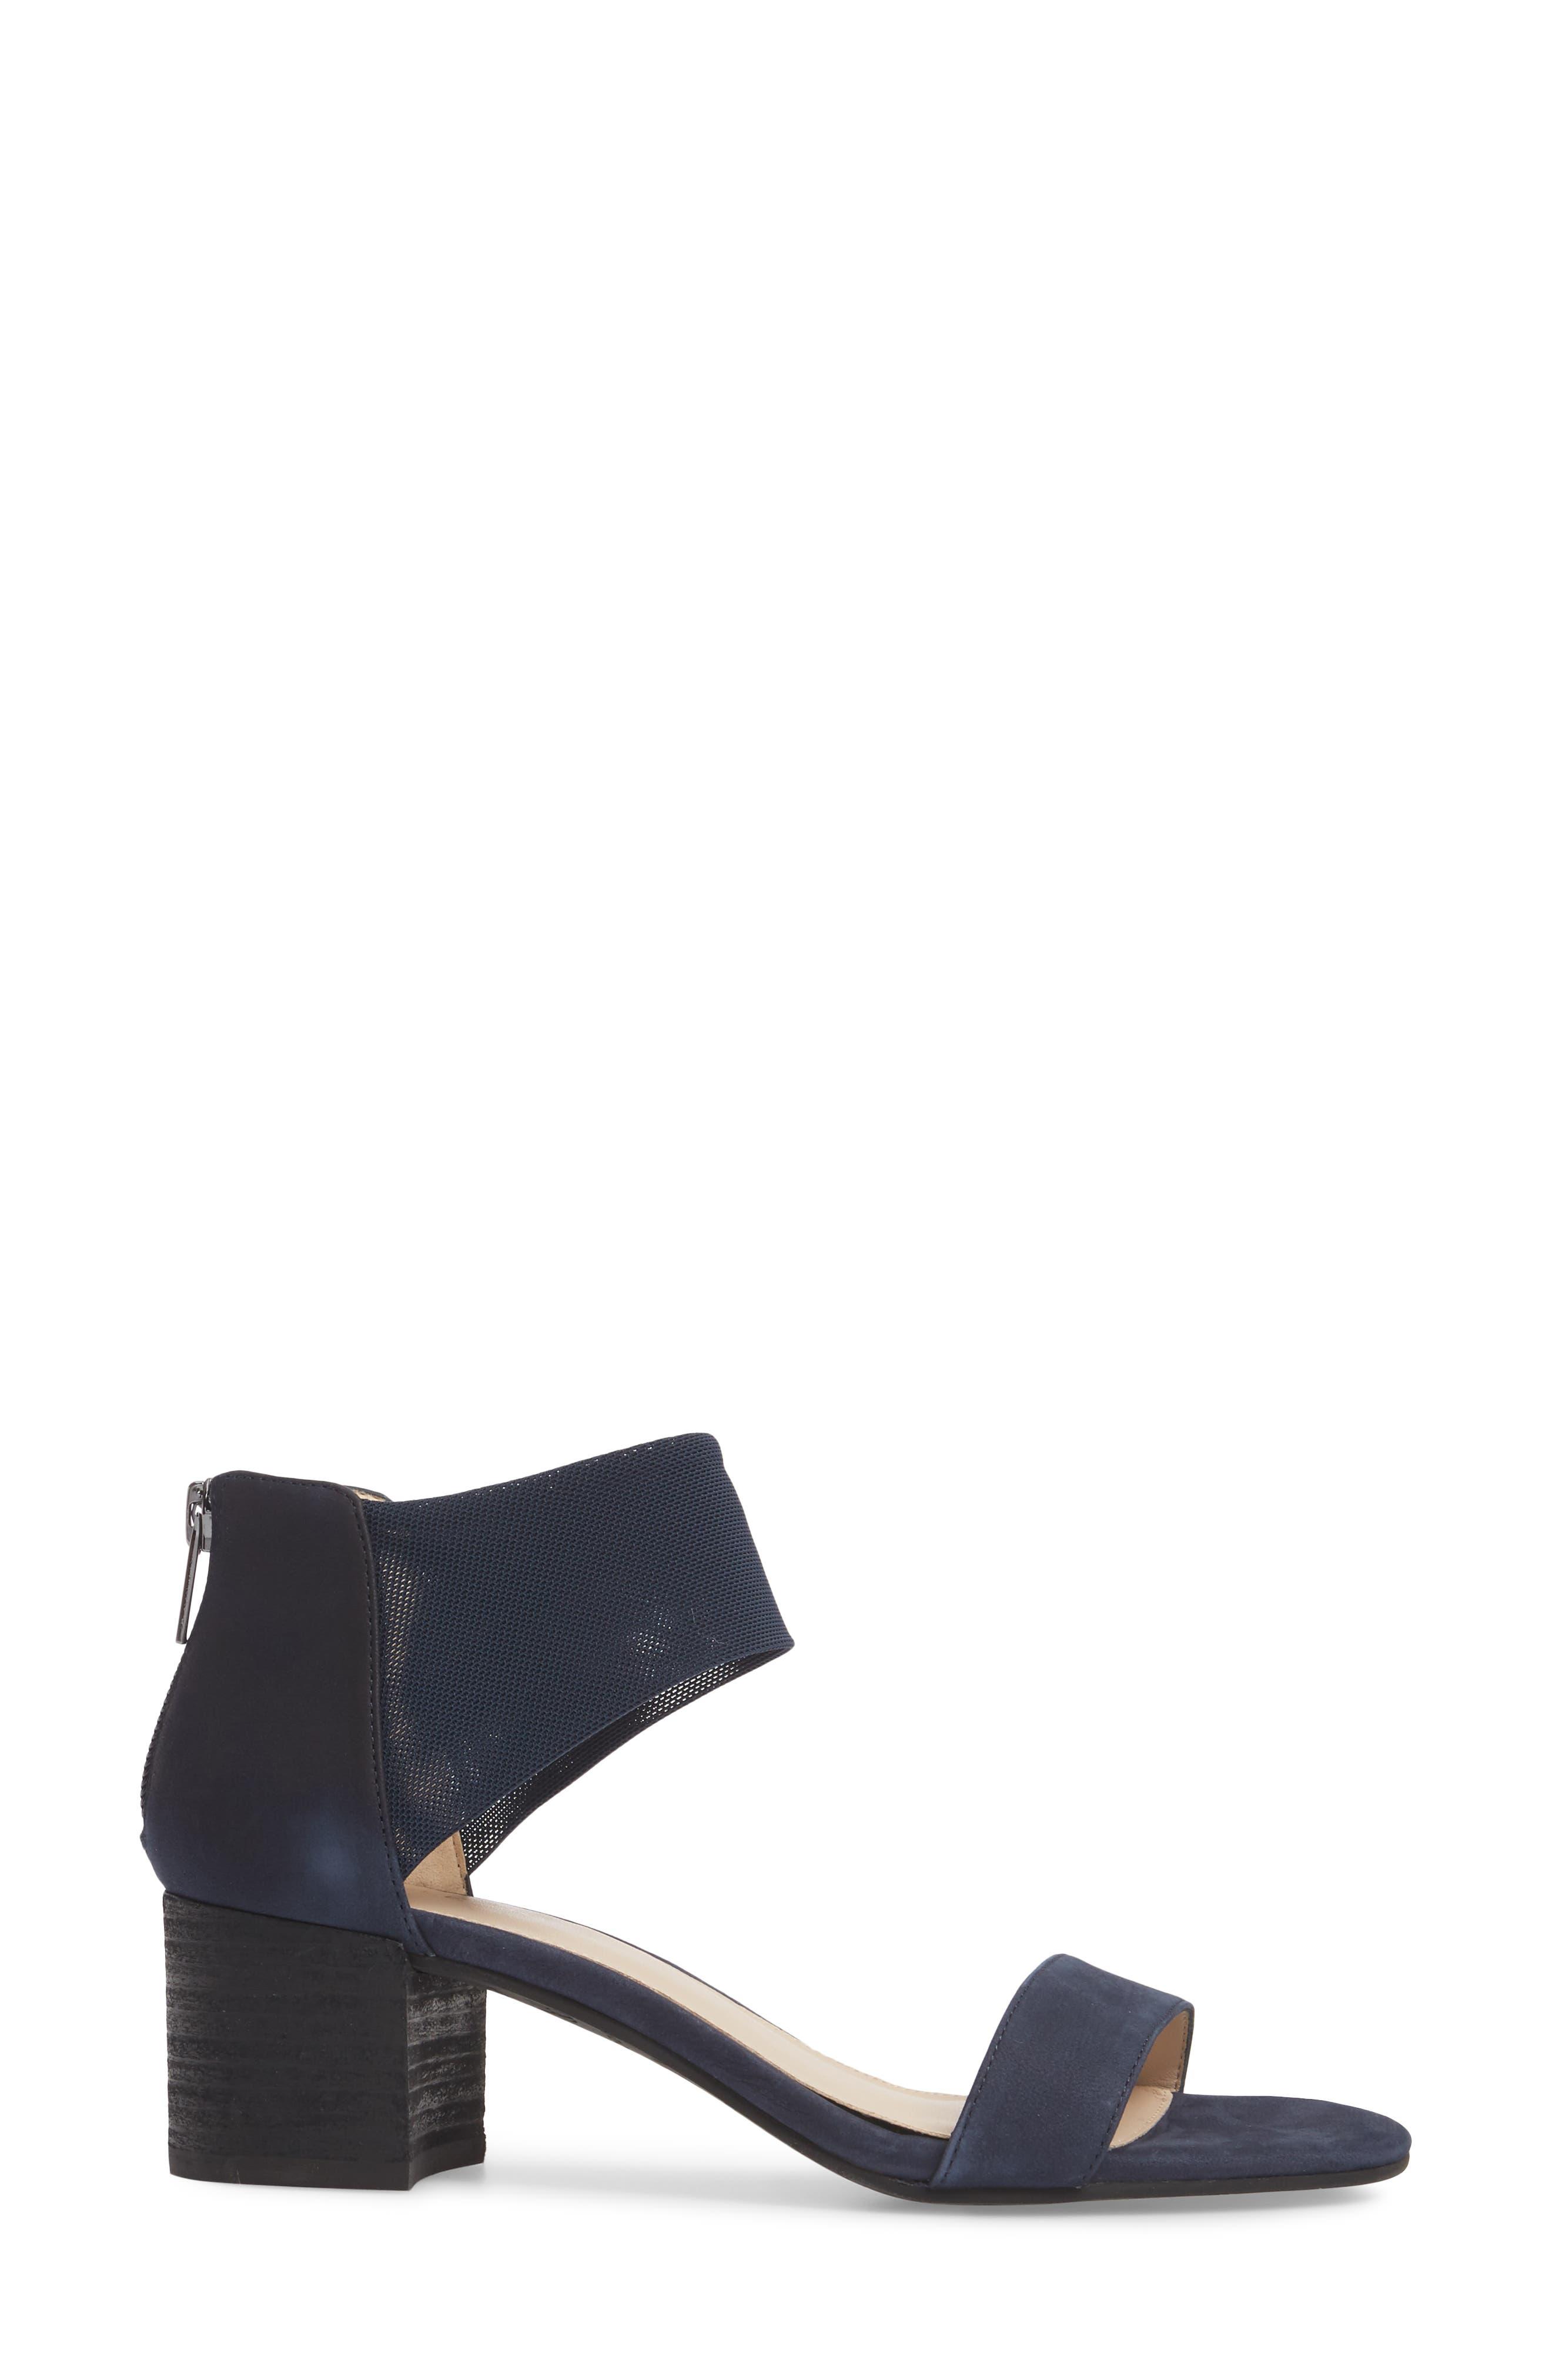 Alden Mesh Strap Sandal,                             Alternate thumbnail 3, color,                             Midnight Nubuck Leather